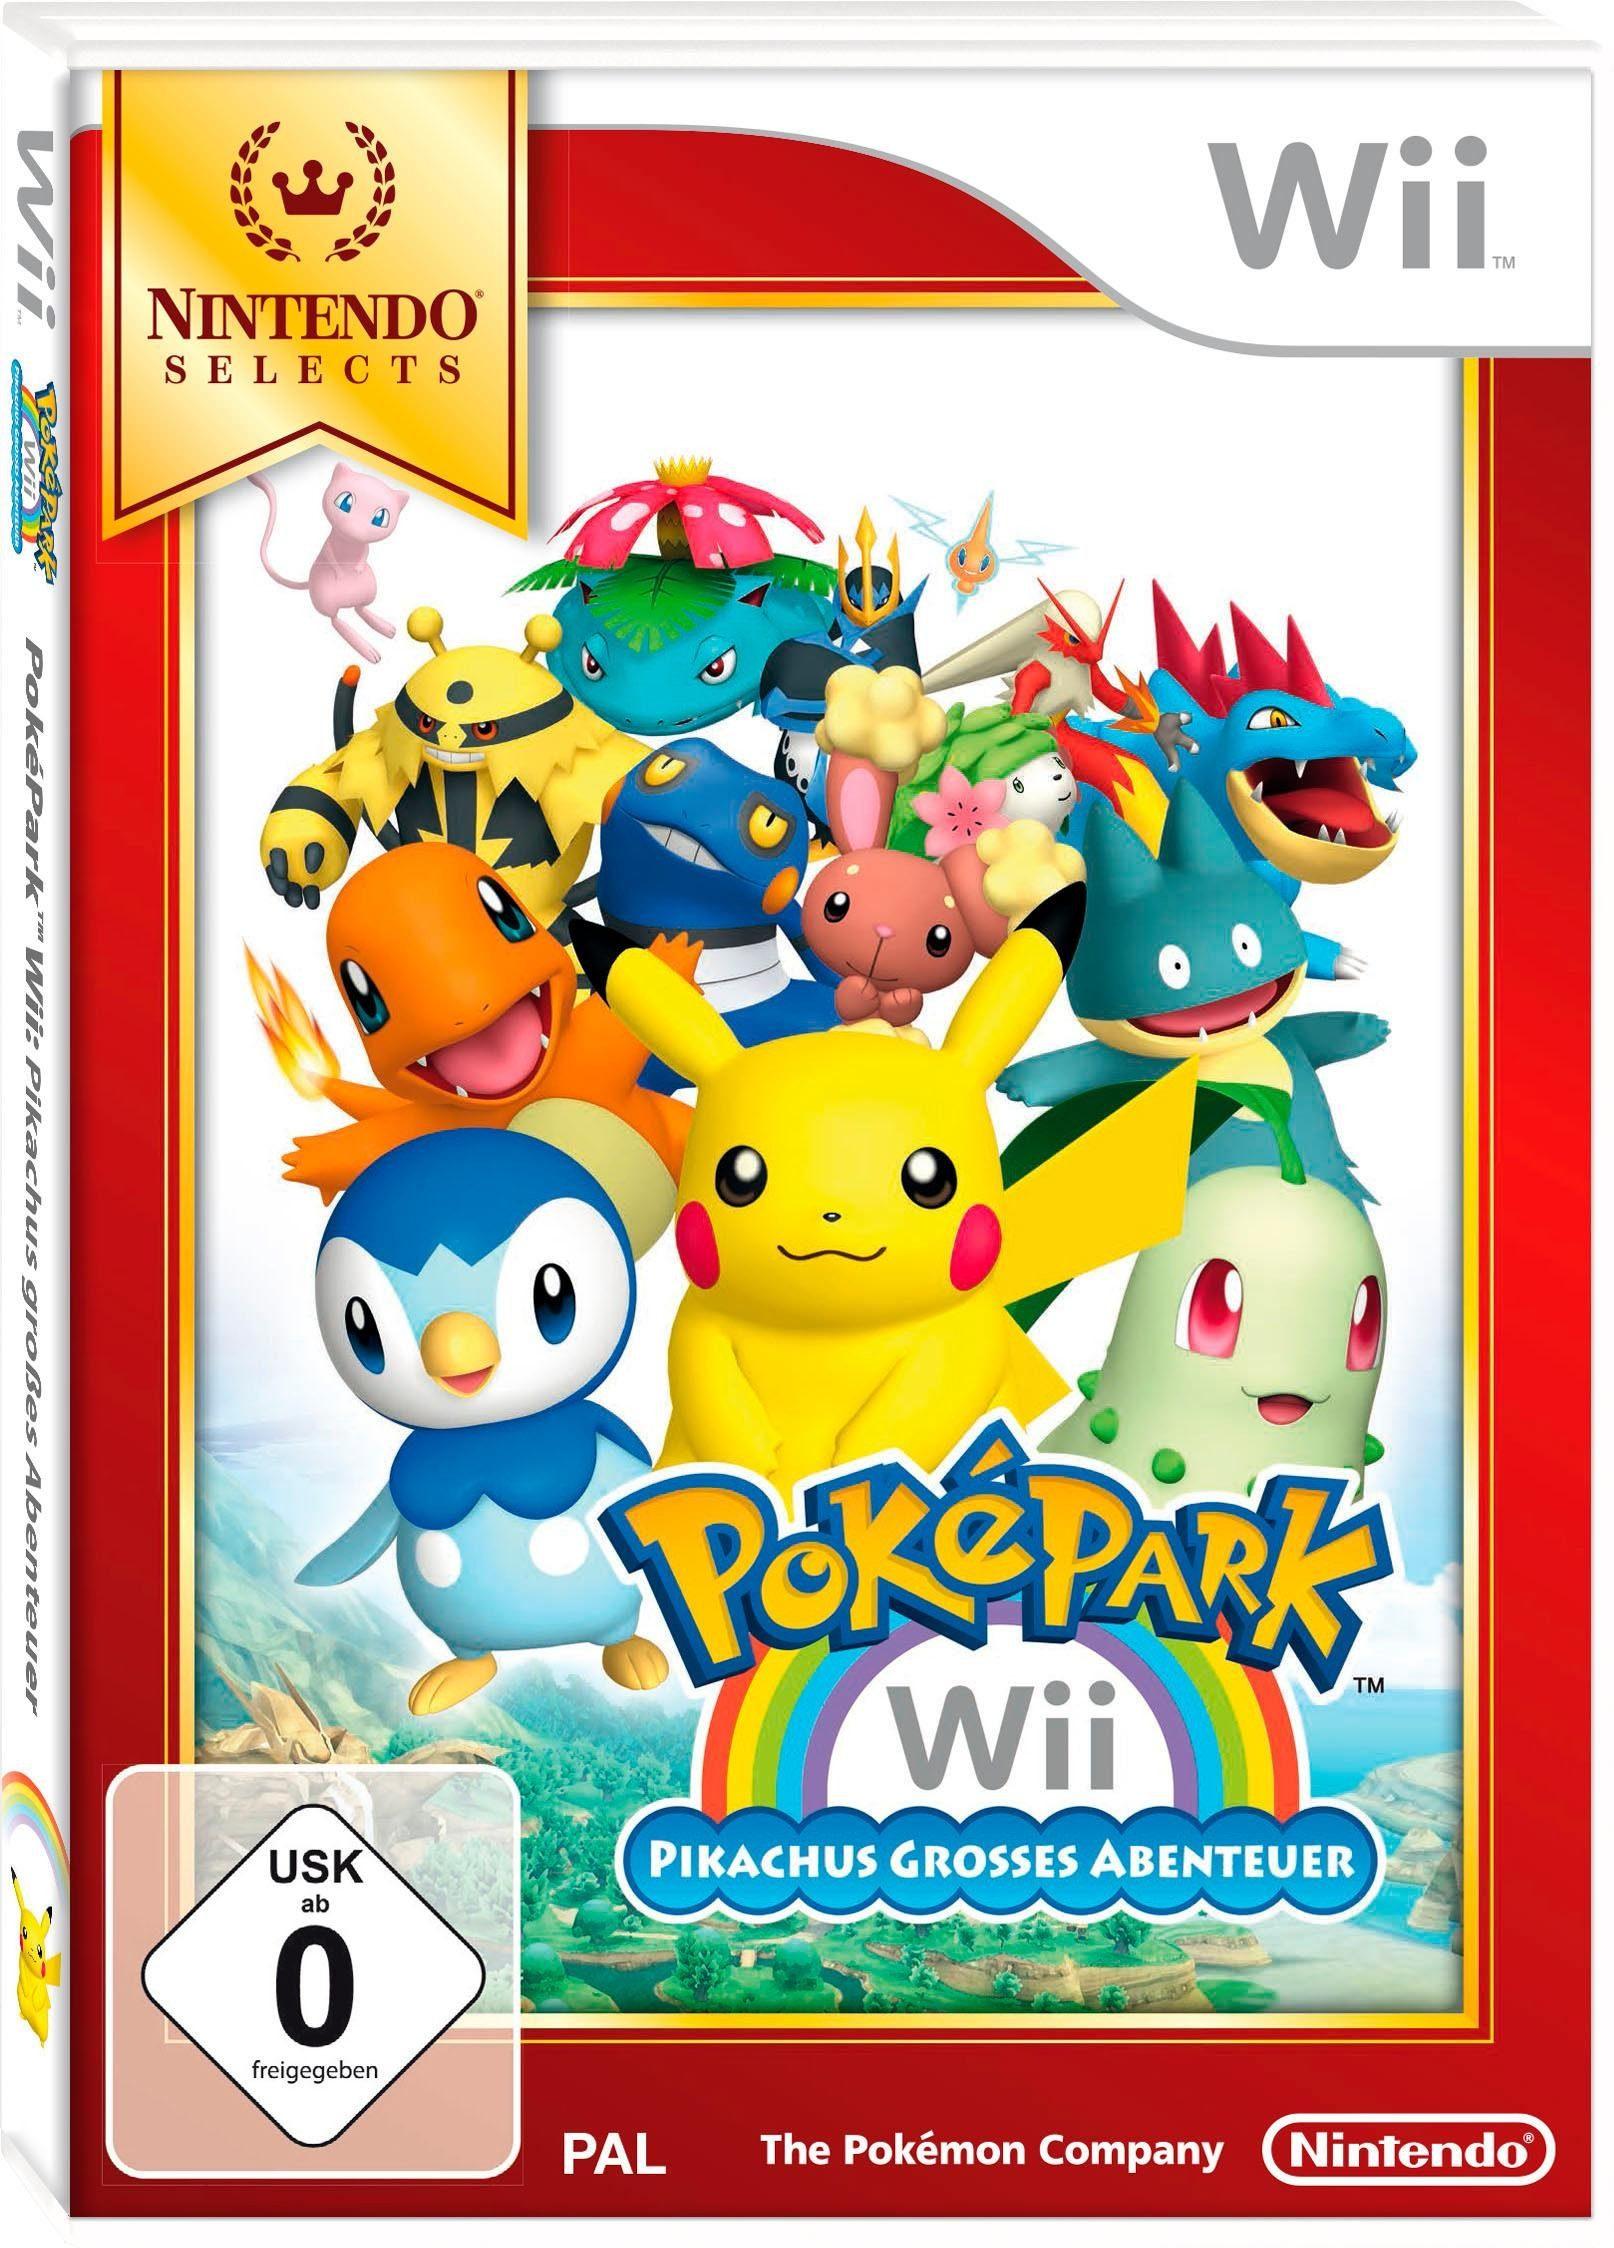 PokéPark Wii: Pikachus großes Abenteuer Nintendo Selects Nintendo Wii